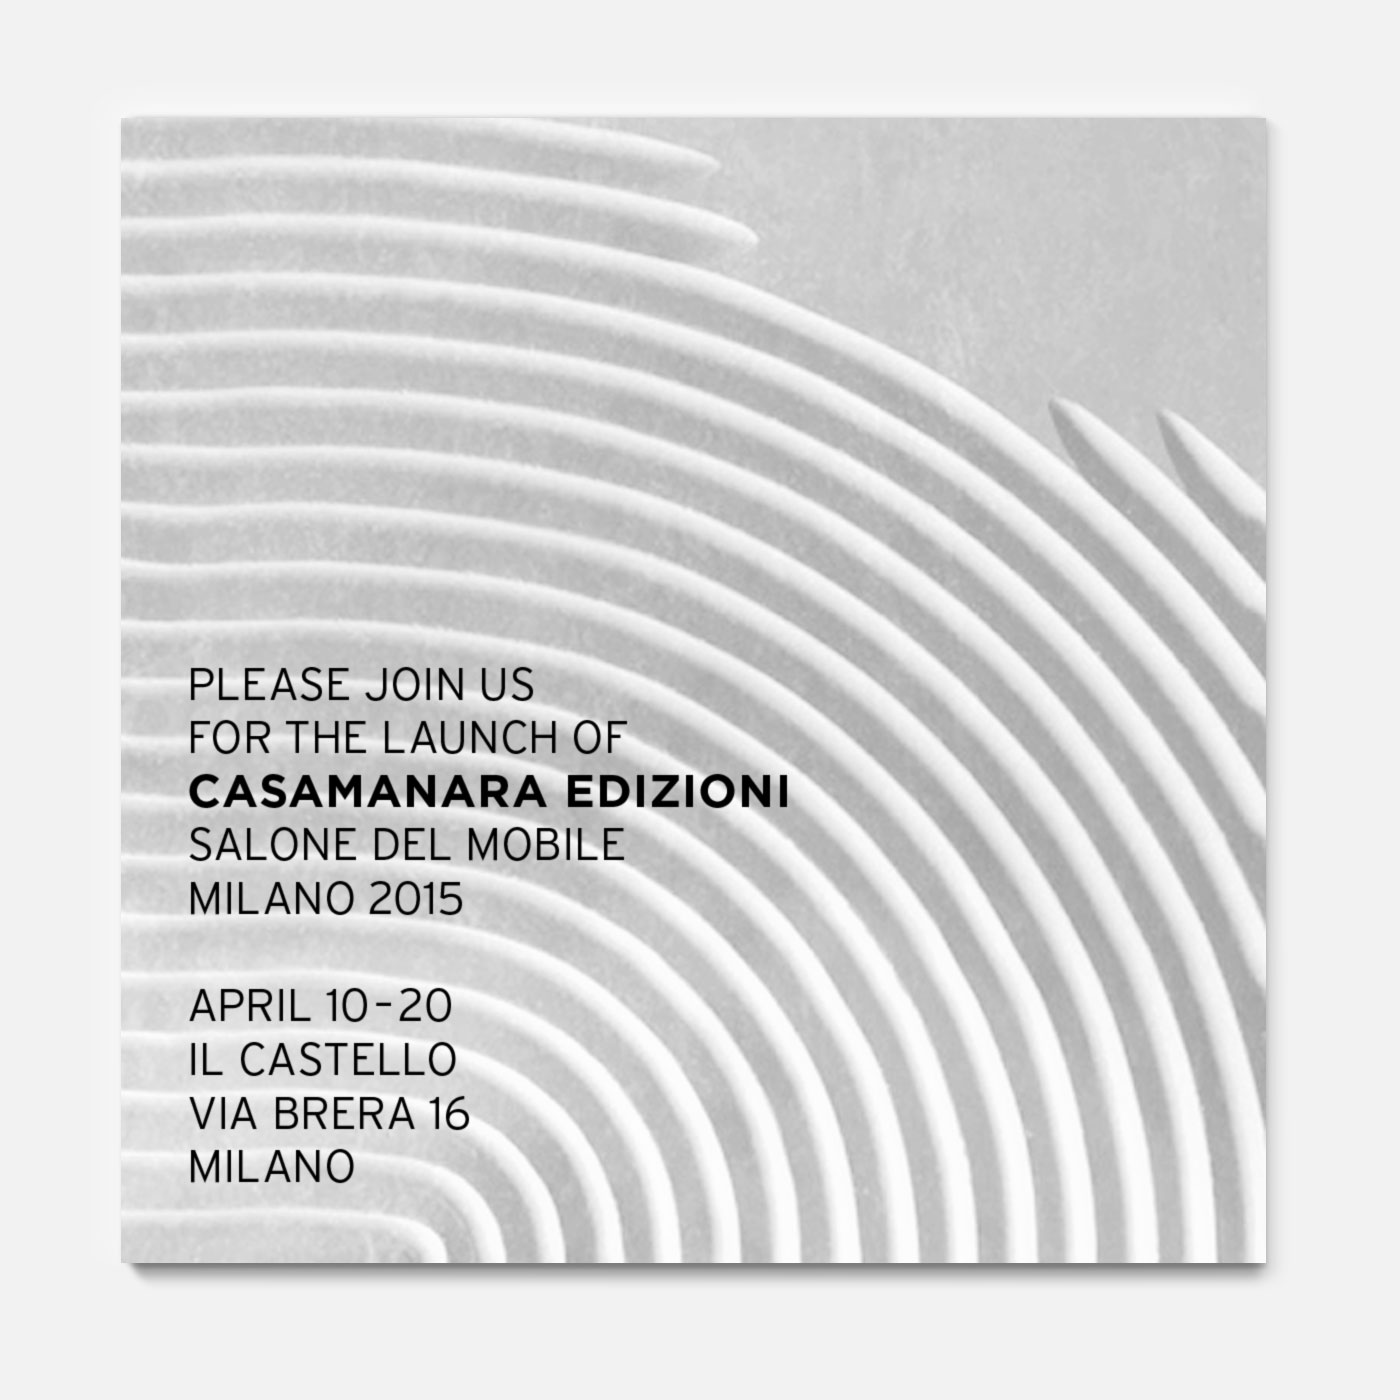 Casamanara Edizioni Back